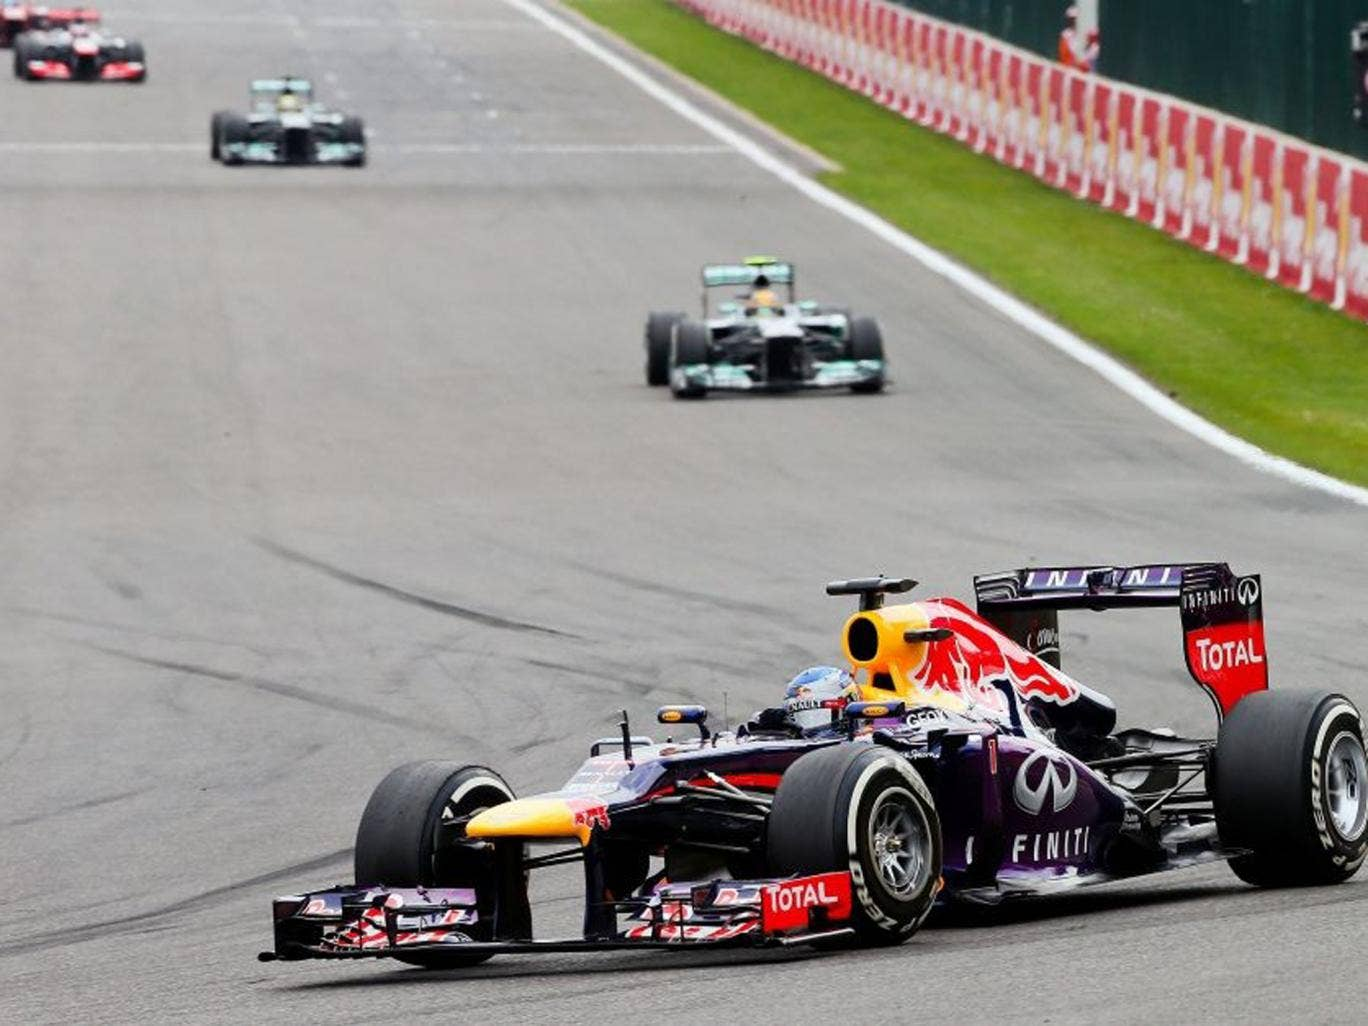 Sebastian Vettel cruised to the 31st win of his Formula One career